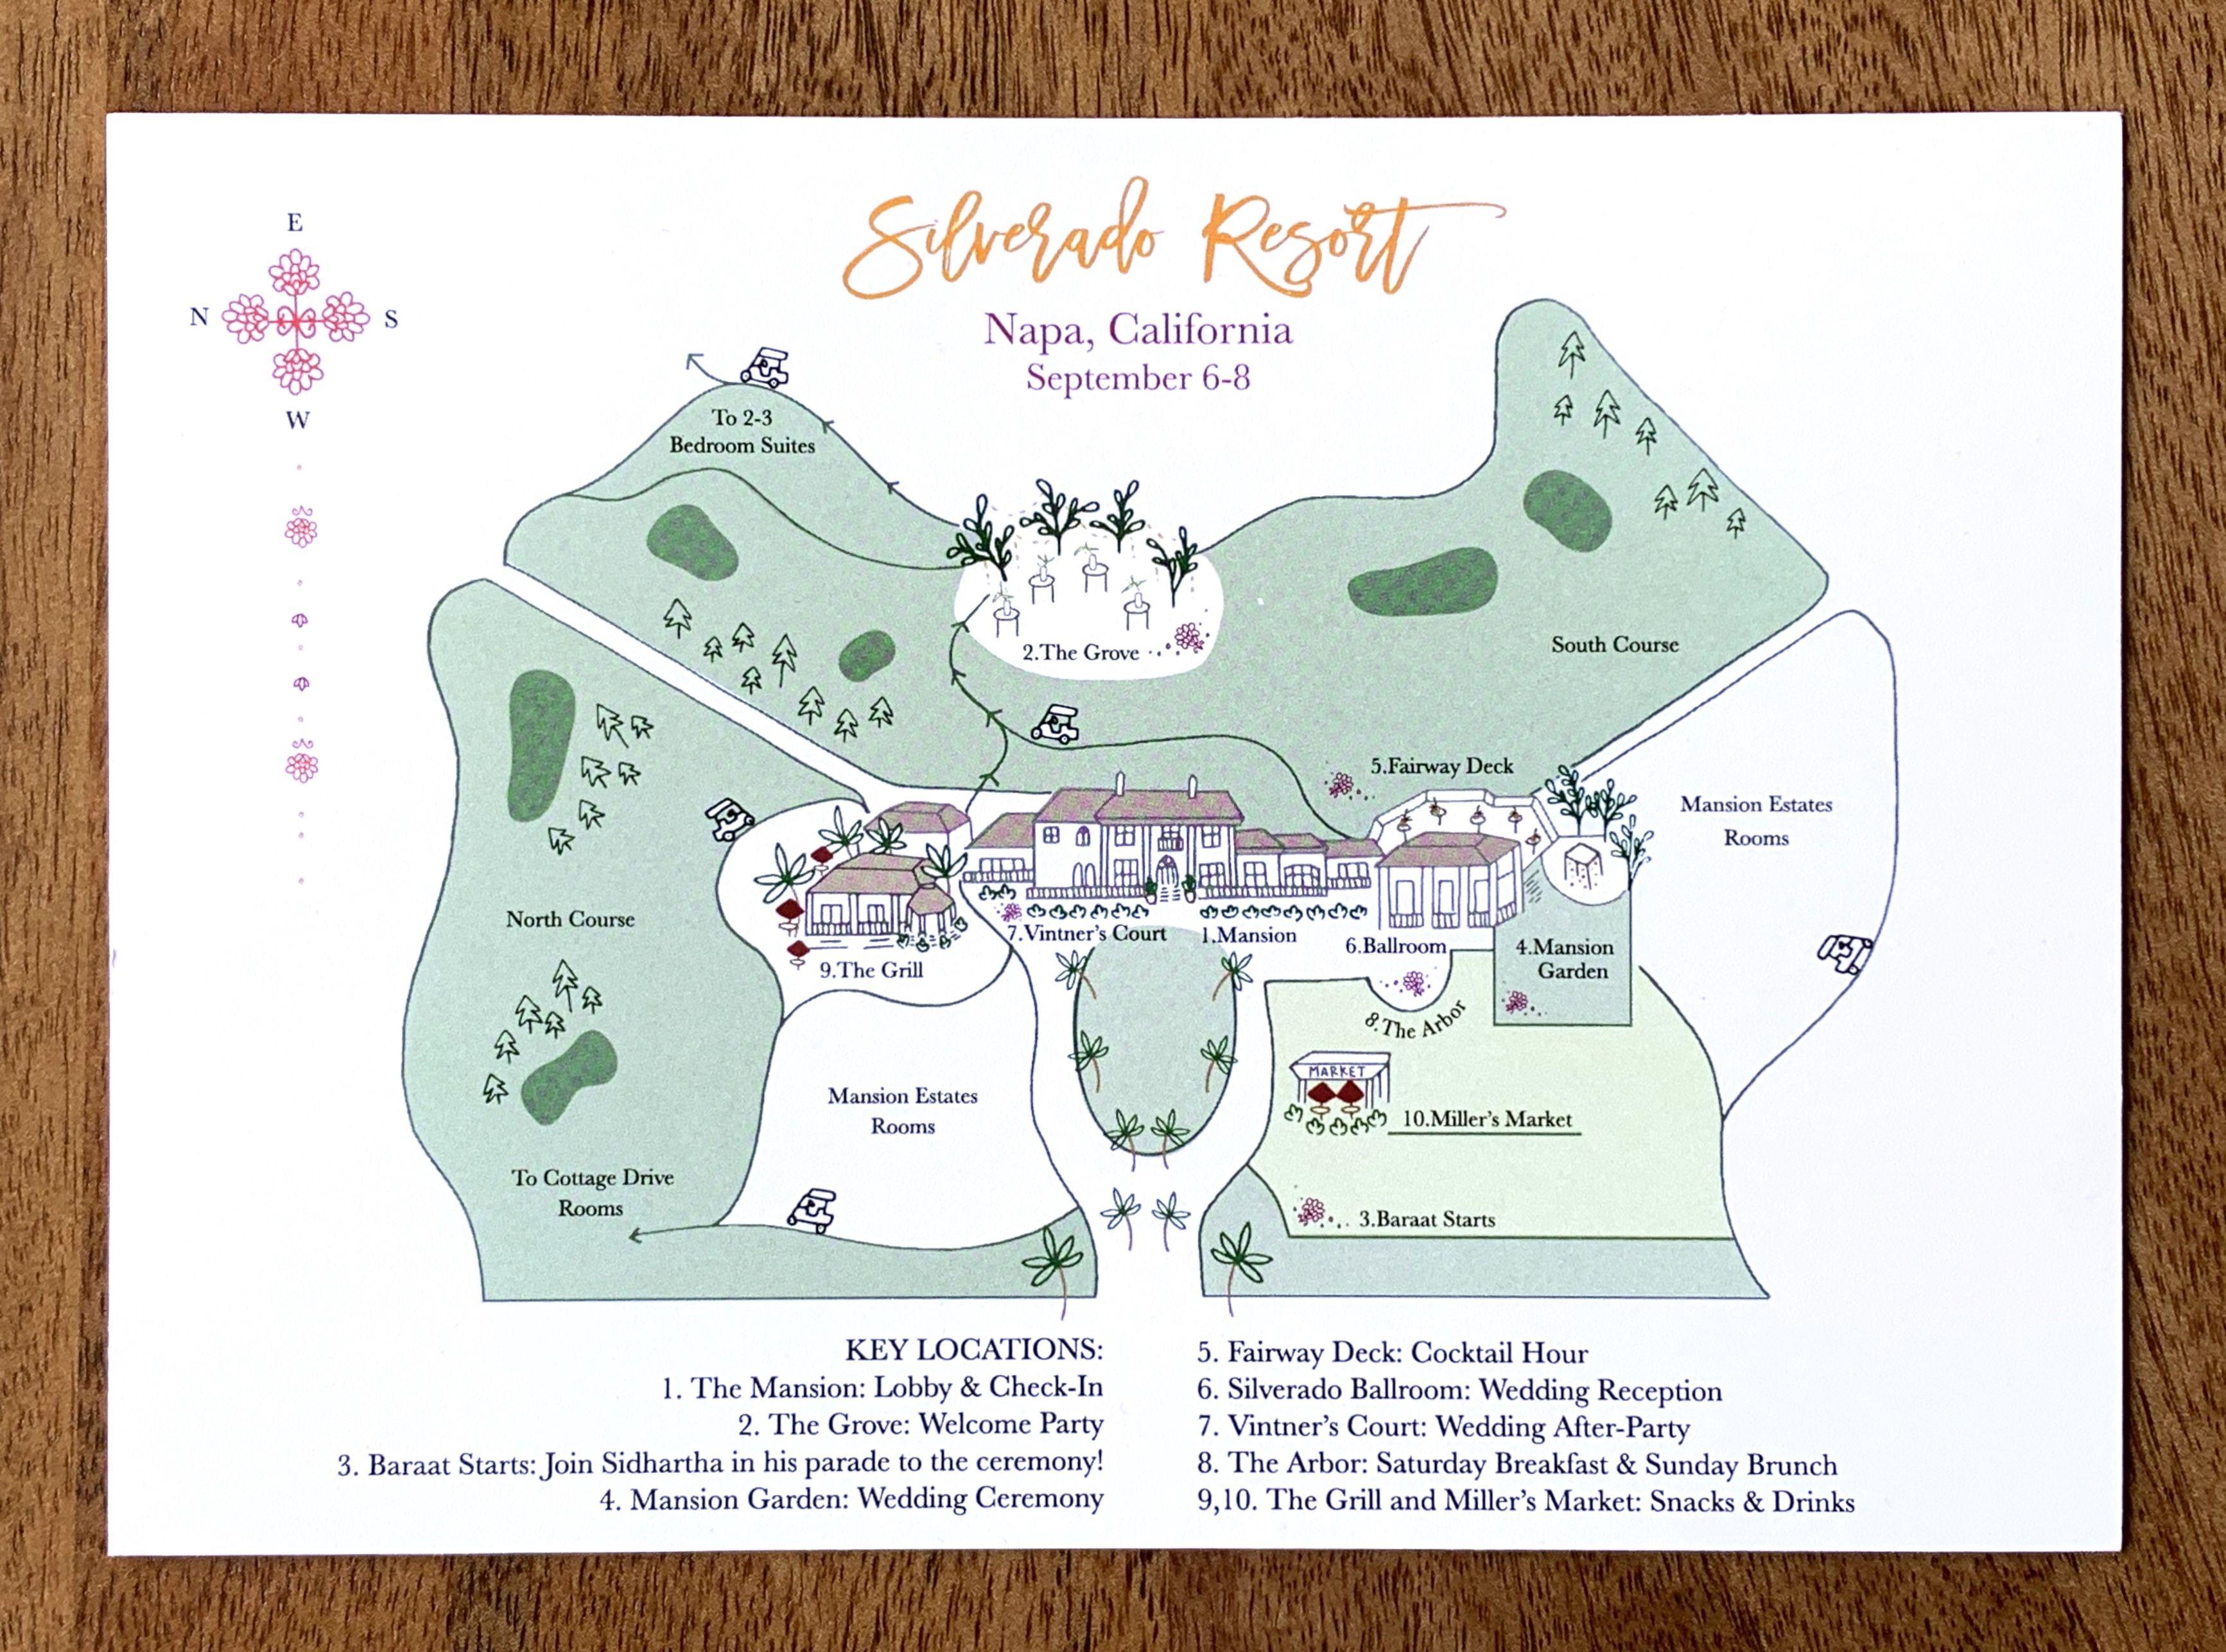 Napa Valley Wedding Map Wedding Map Napa Valley Wedding Wedding Weekend Itinerary